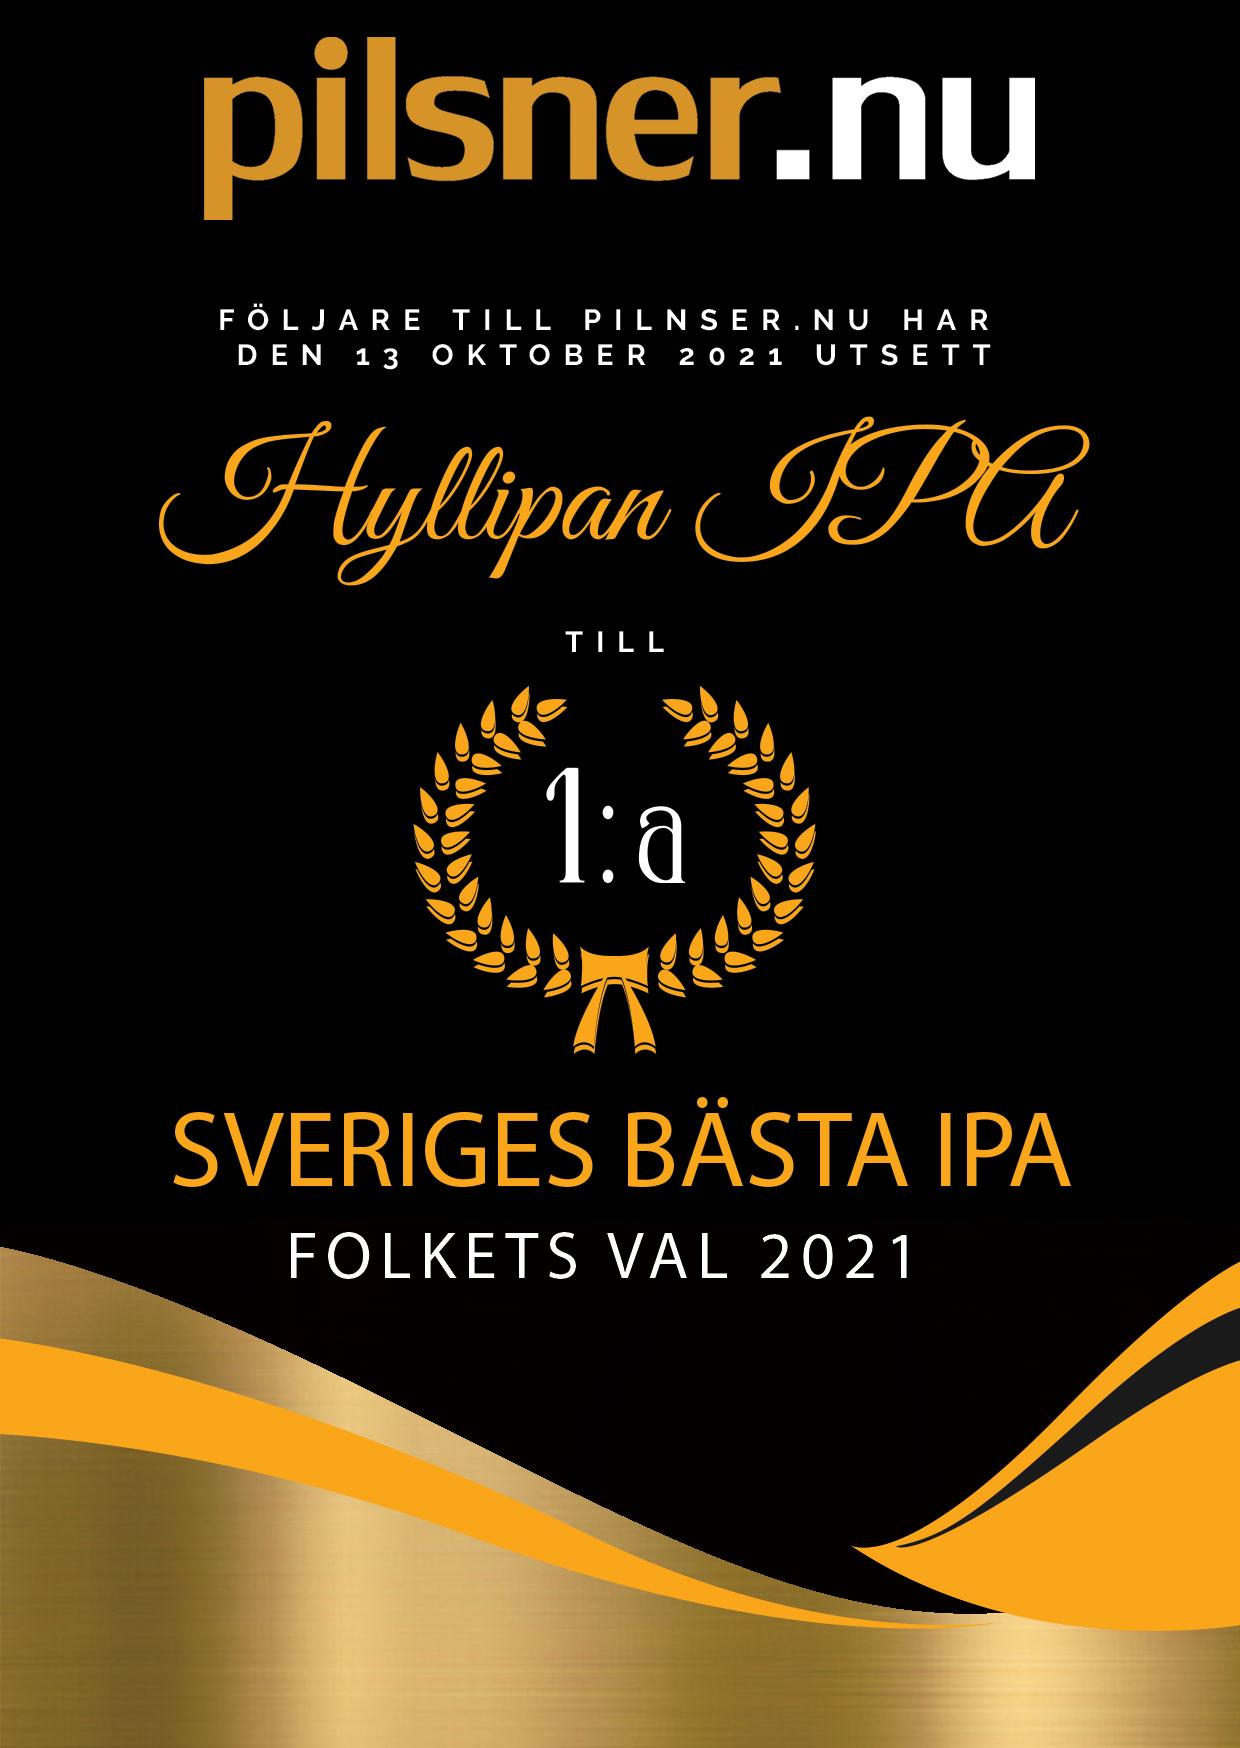 Diplom IPA 1a plats Hyllie Hyllipa